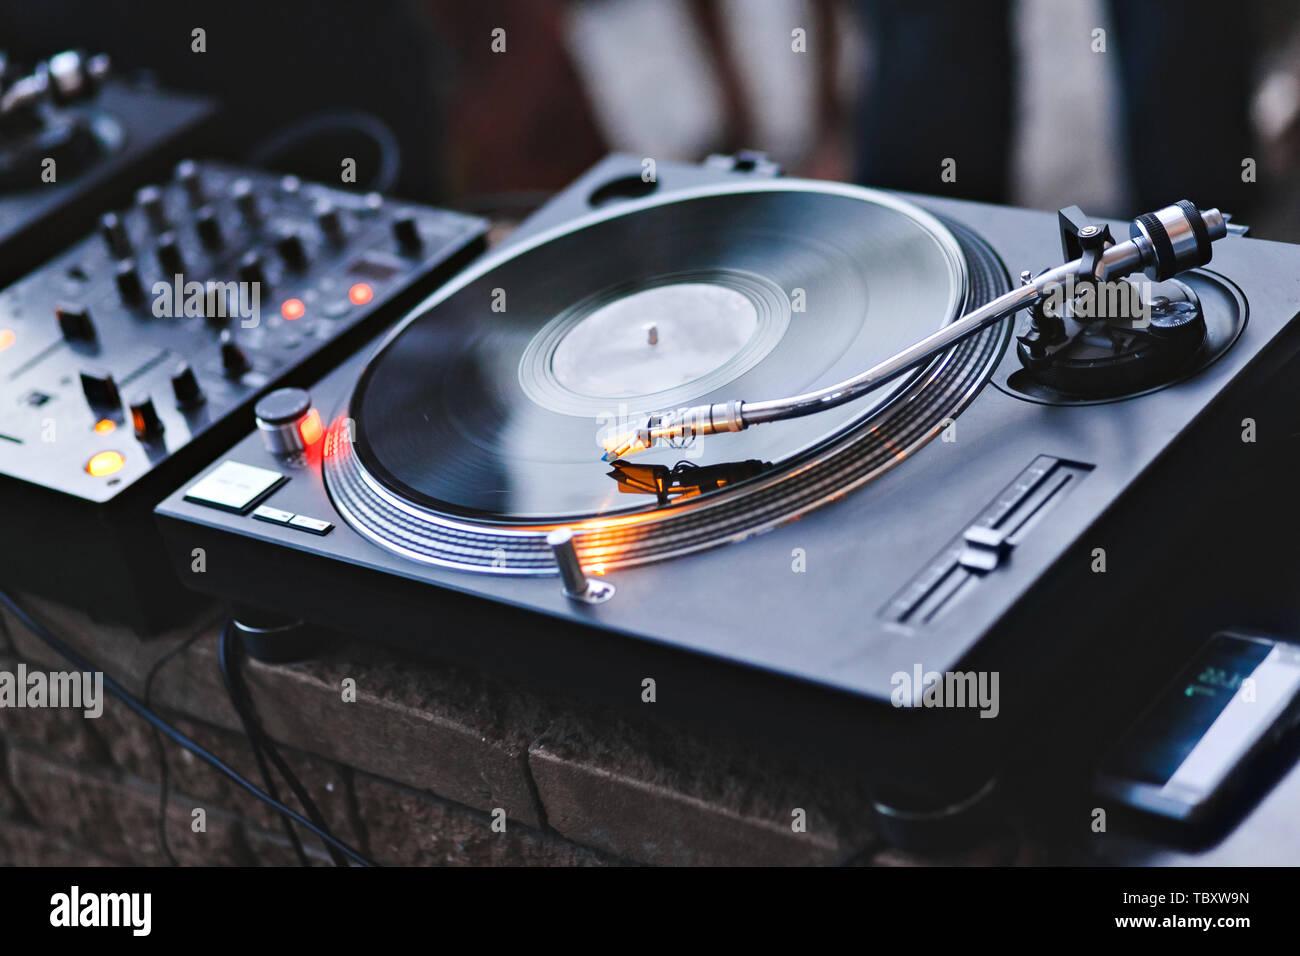 Needle on a vinyl record  Turntable vinyl record player